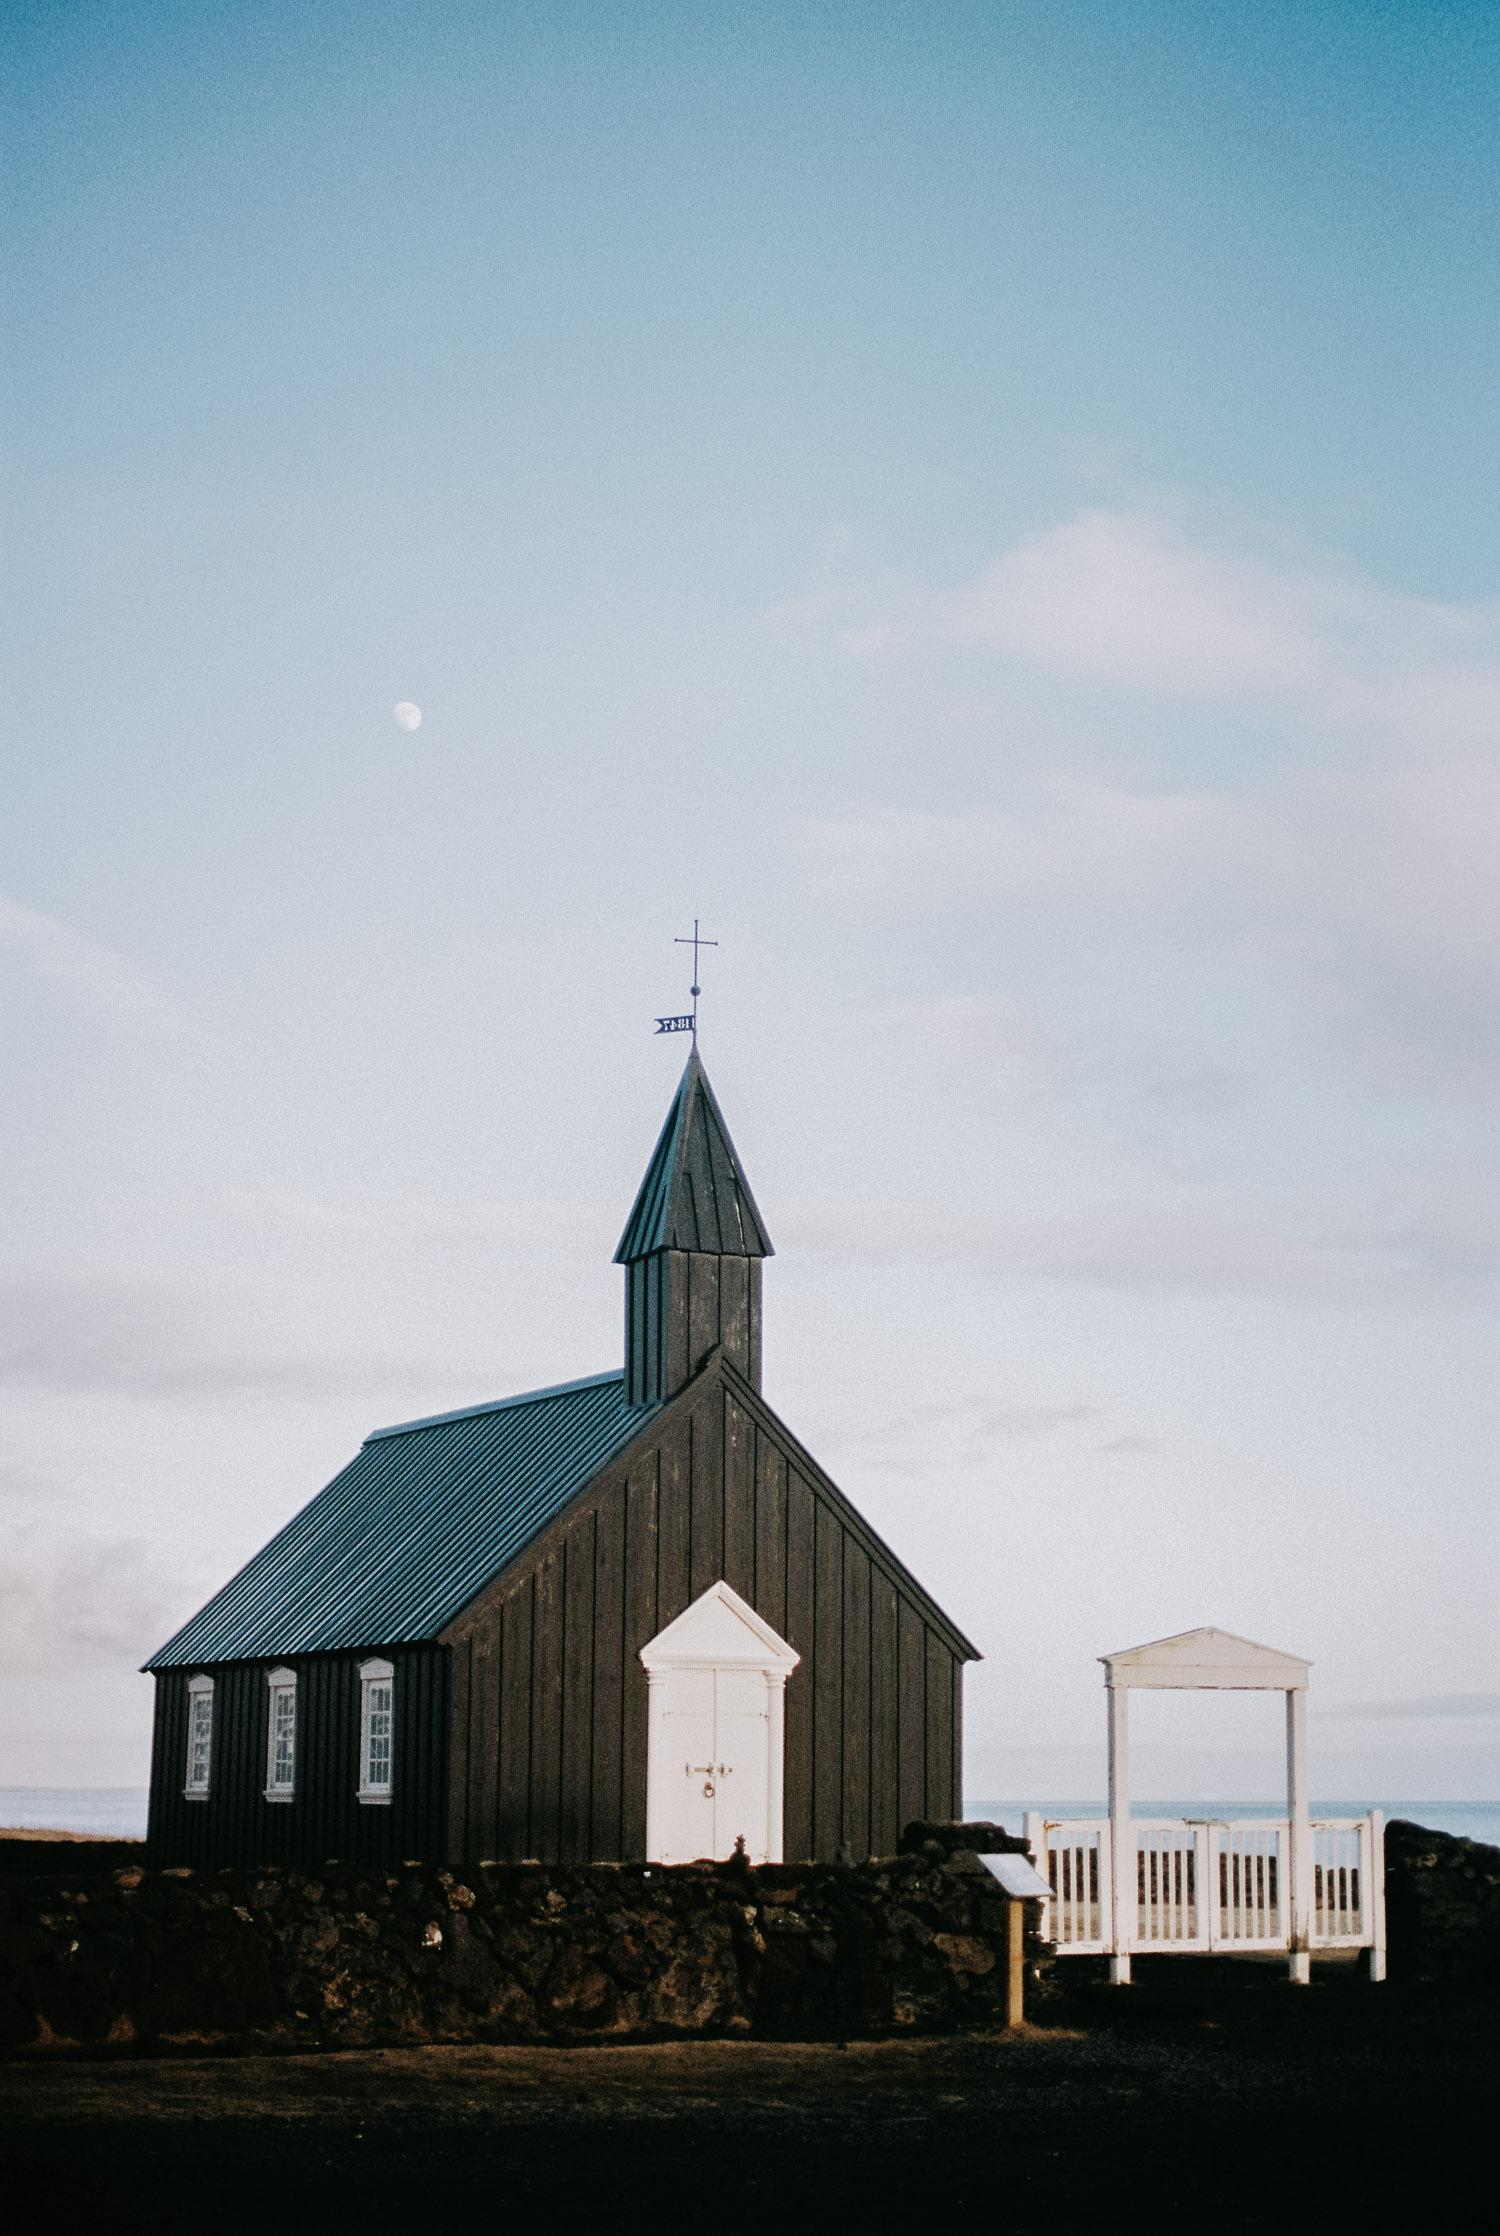 004-Budir-Wedding- Photographer-Iceland Bridal-11.jpg